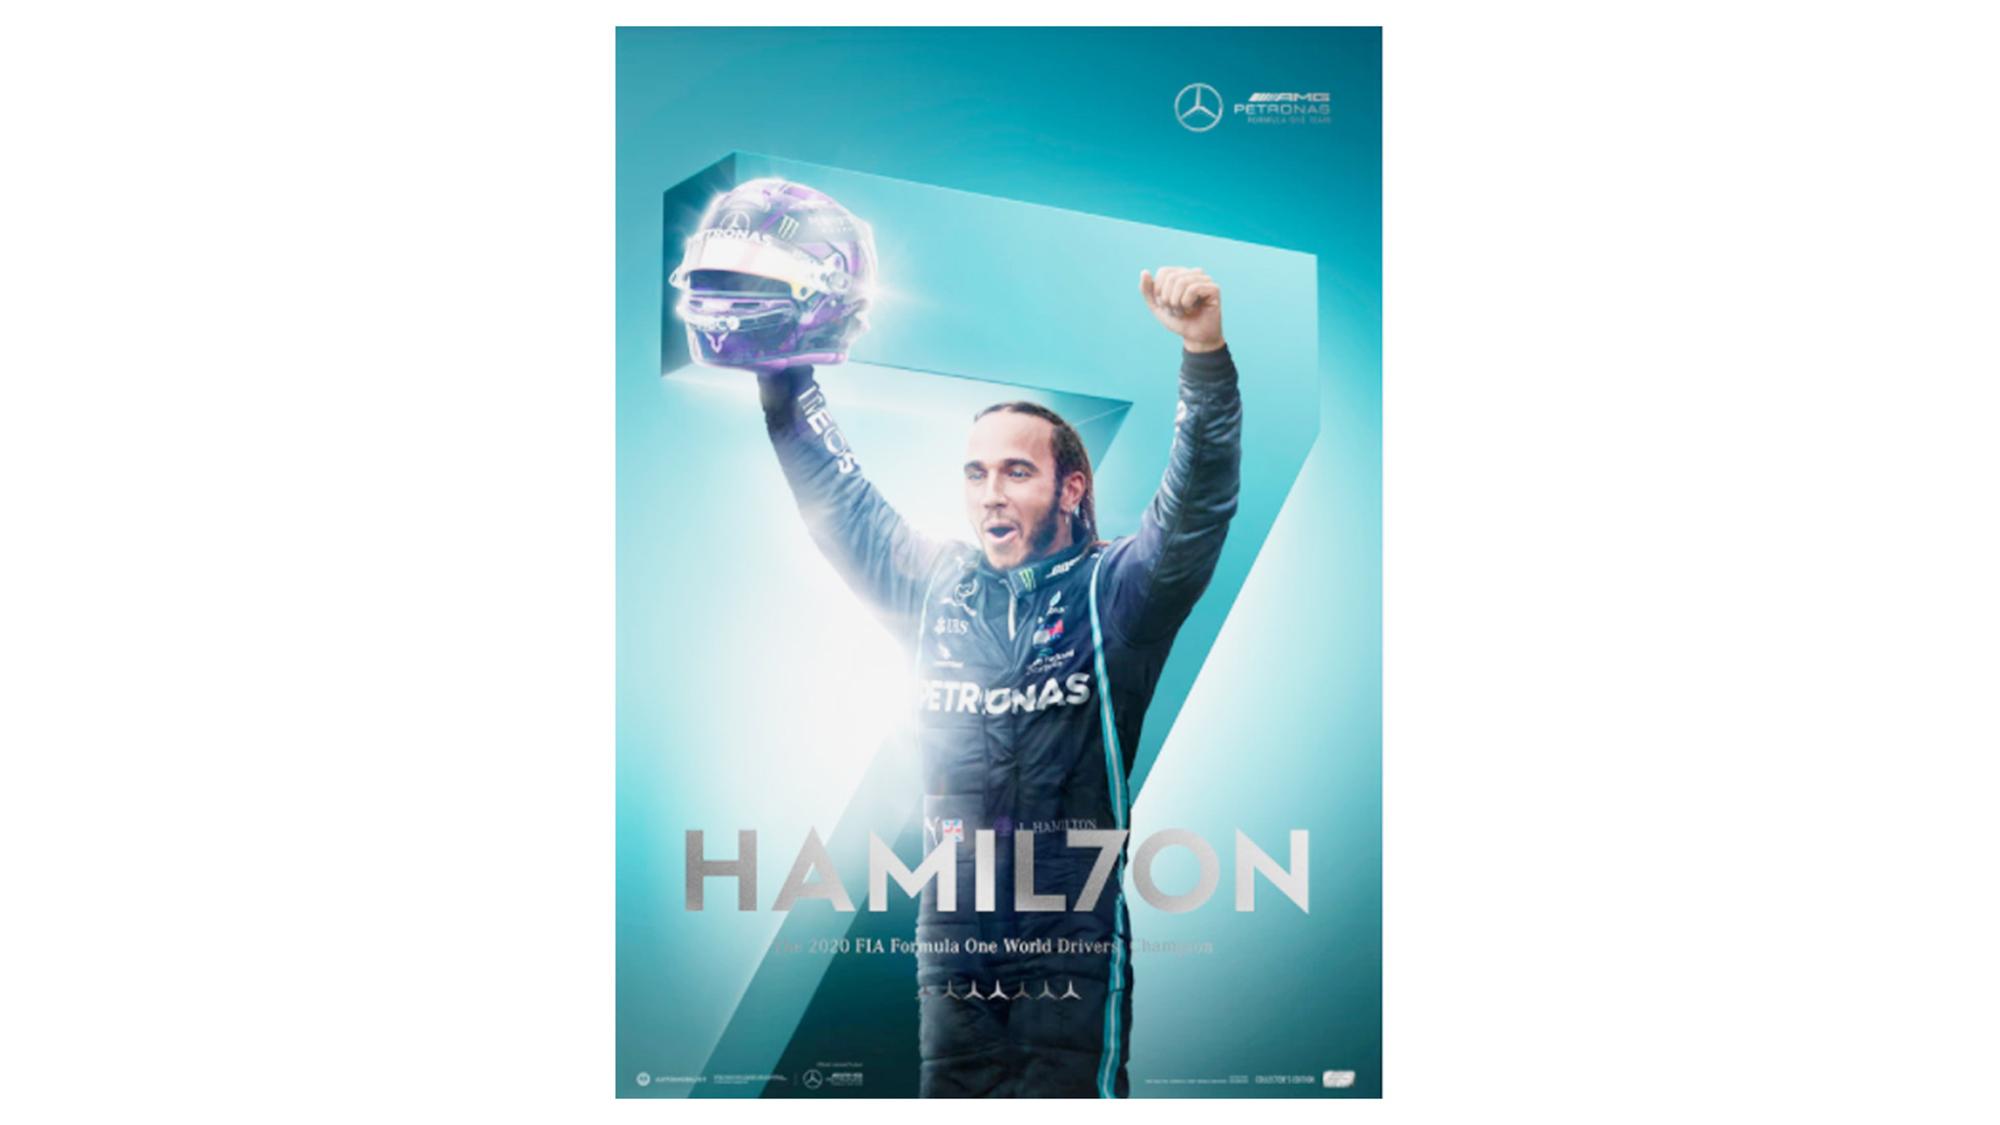 Hamilton 7 poster